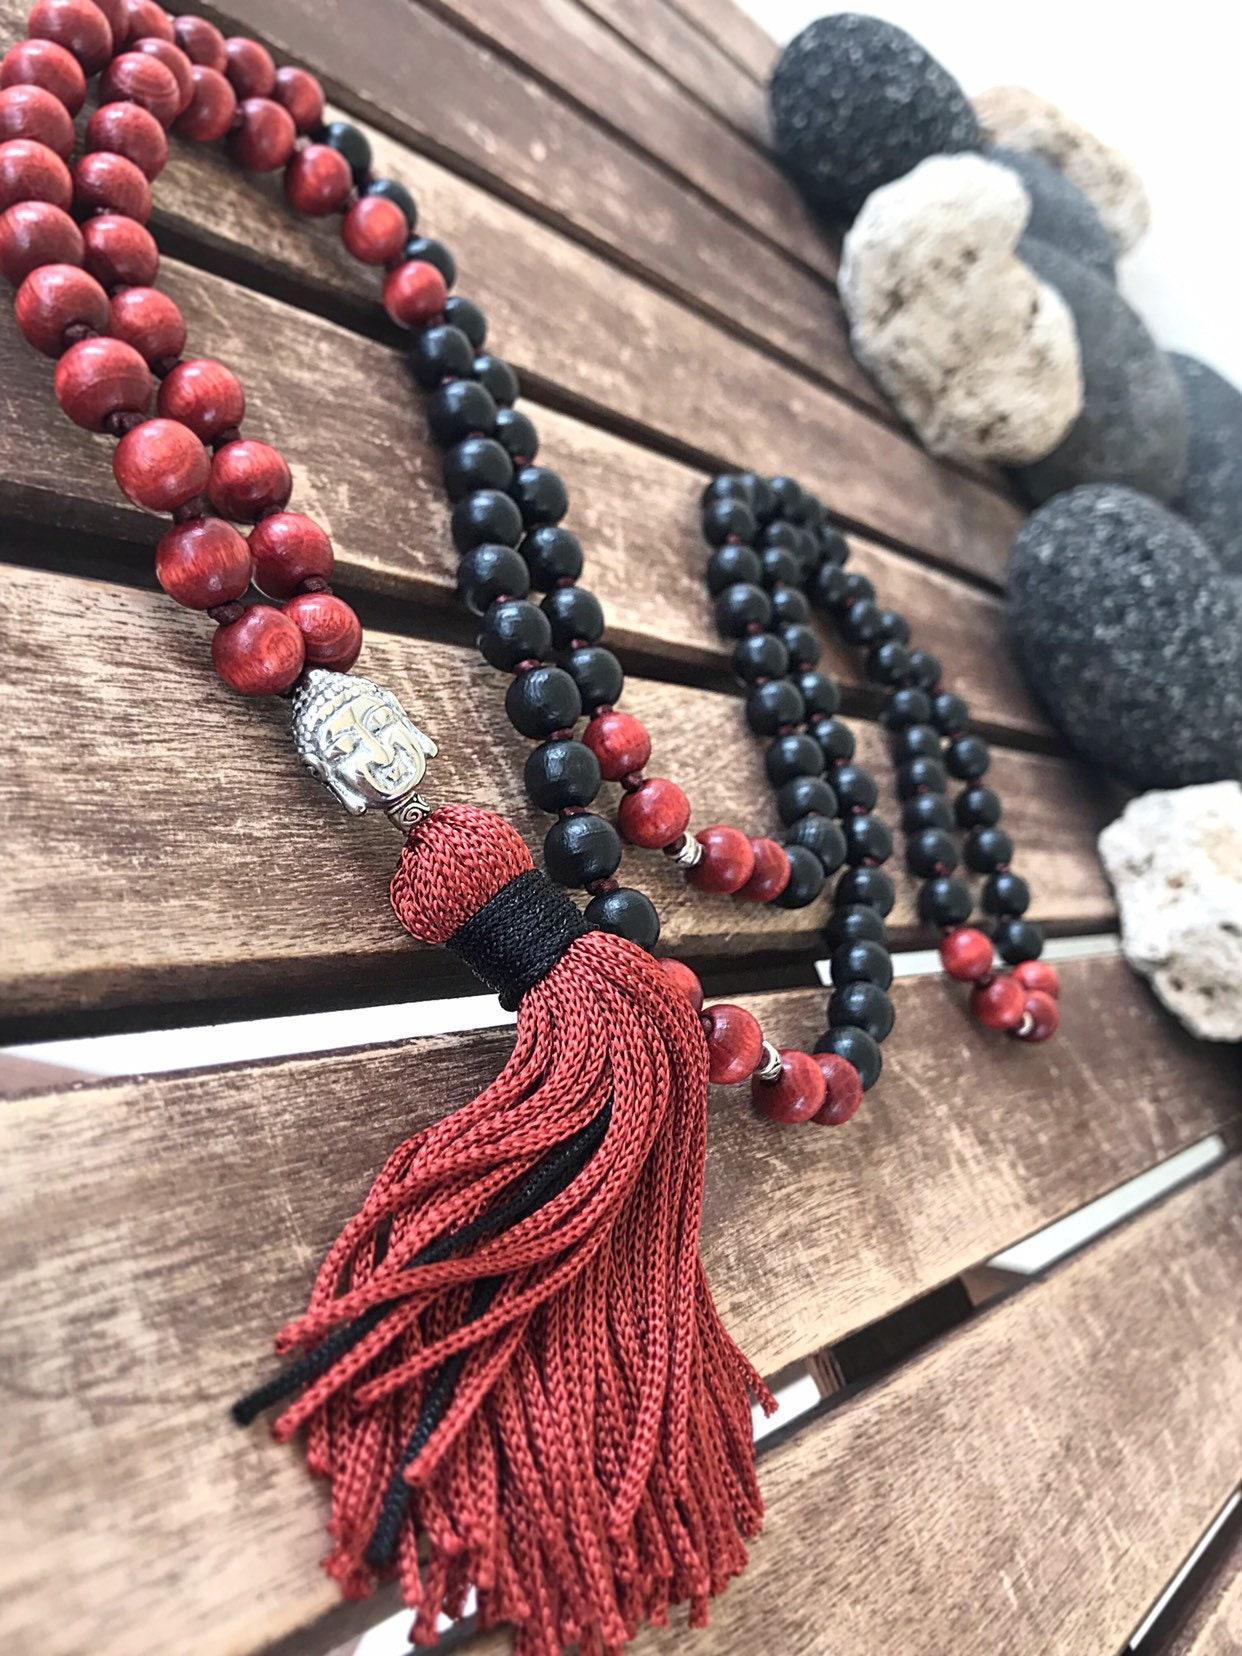 108 Holz Mala Perlen Geknotet Buddha Mala Kette Mit Quaste Etsy